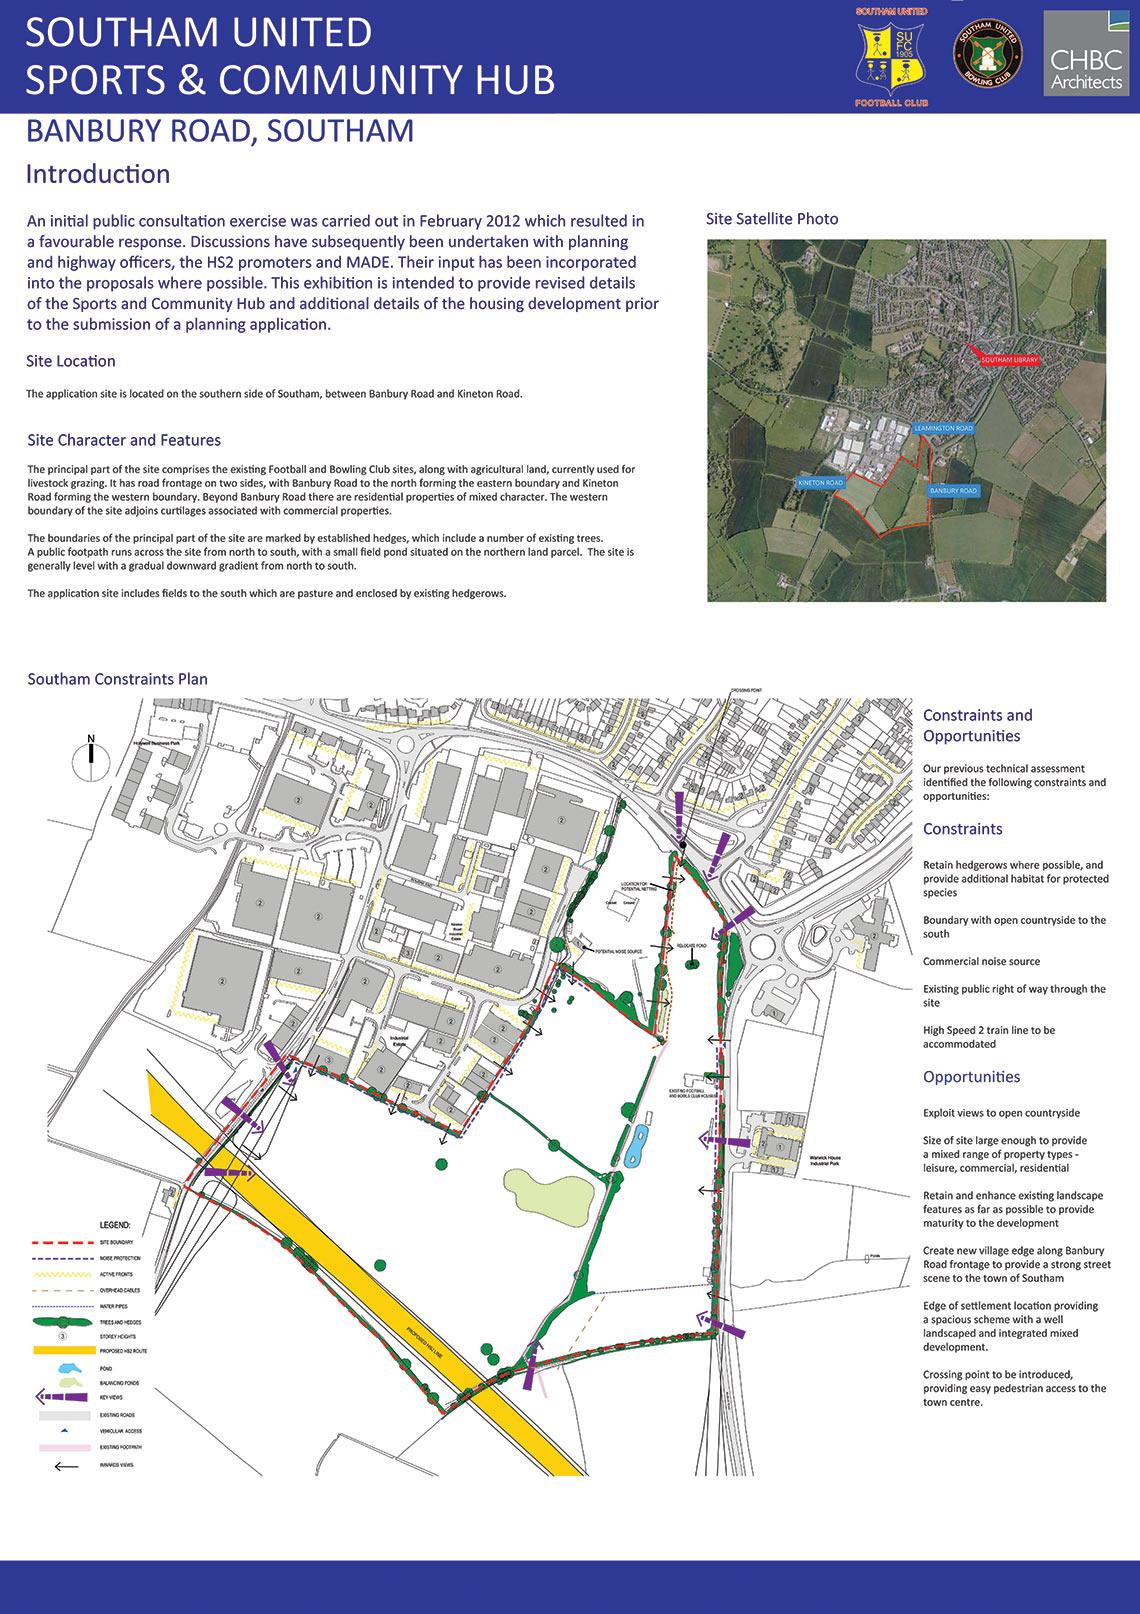 Project-Banbury-1-1140px